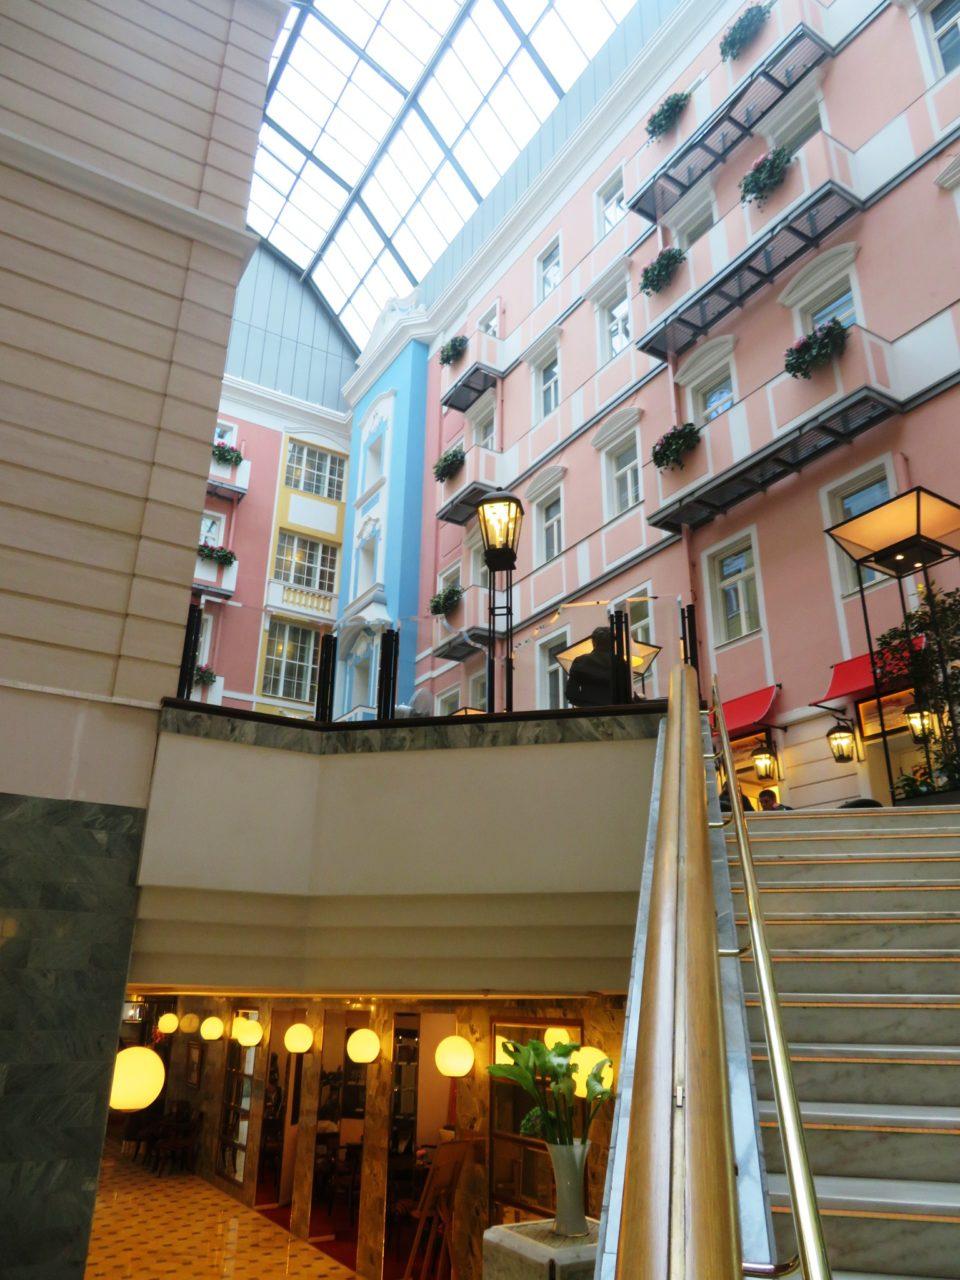 Stunningly beautiful interior of Belmond Grand Hotel Europe in Saint Petersburg, Russia